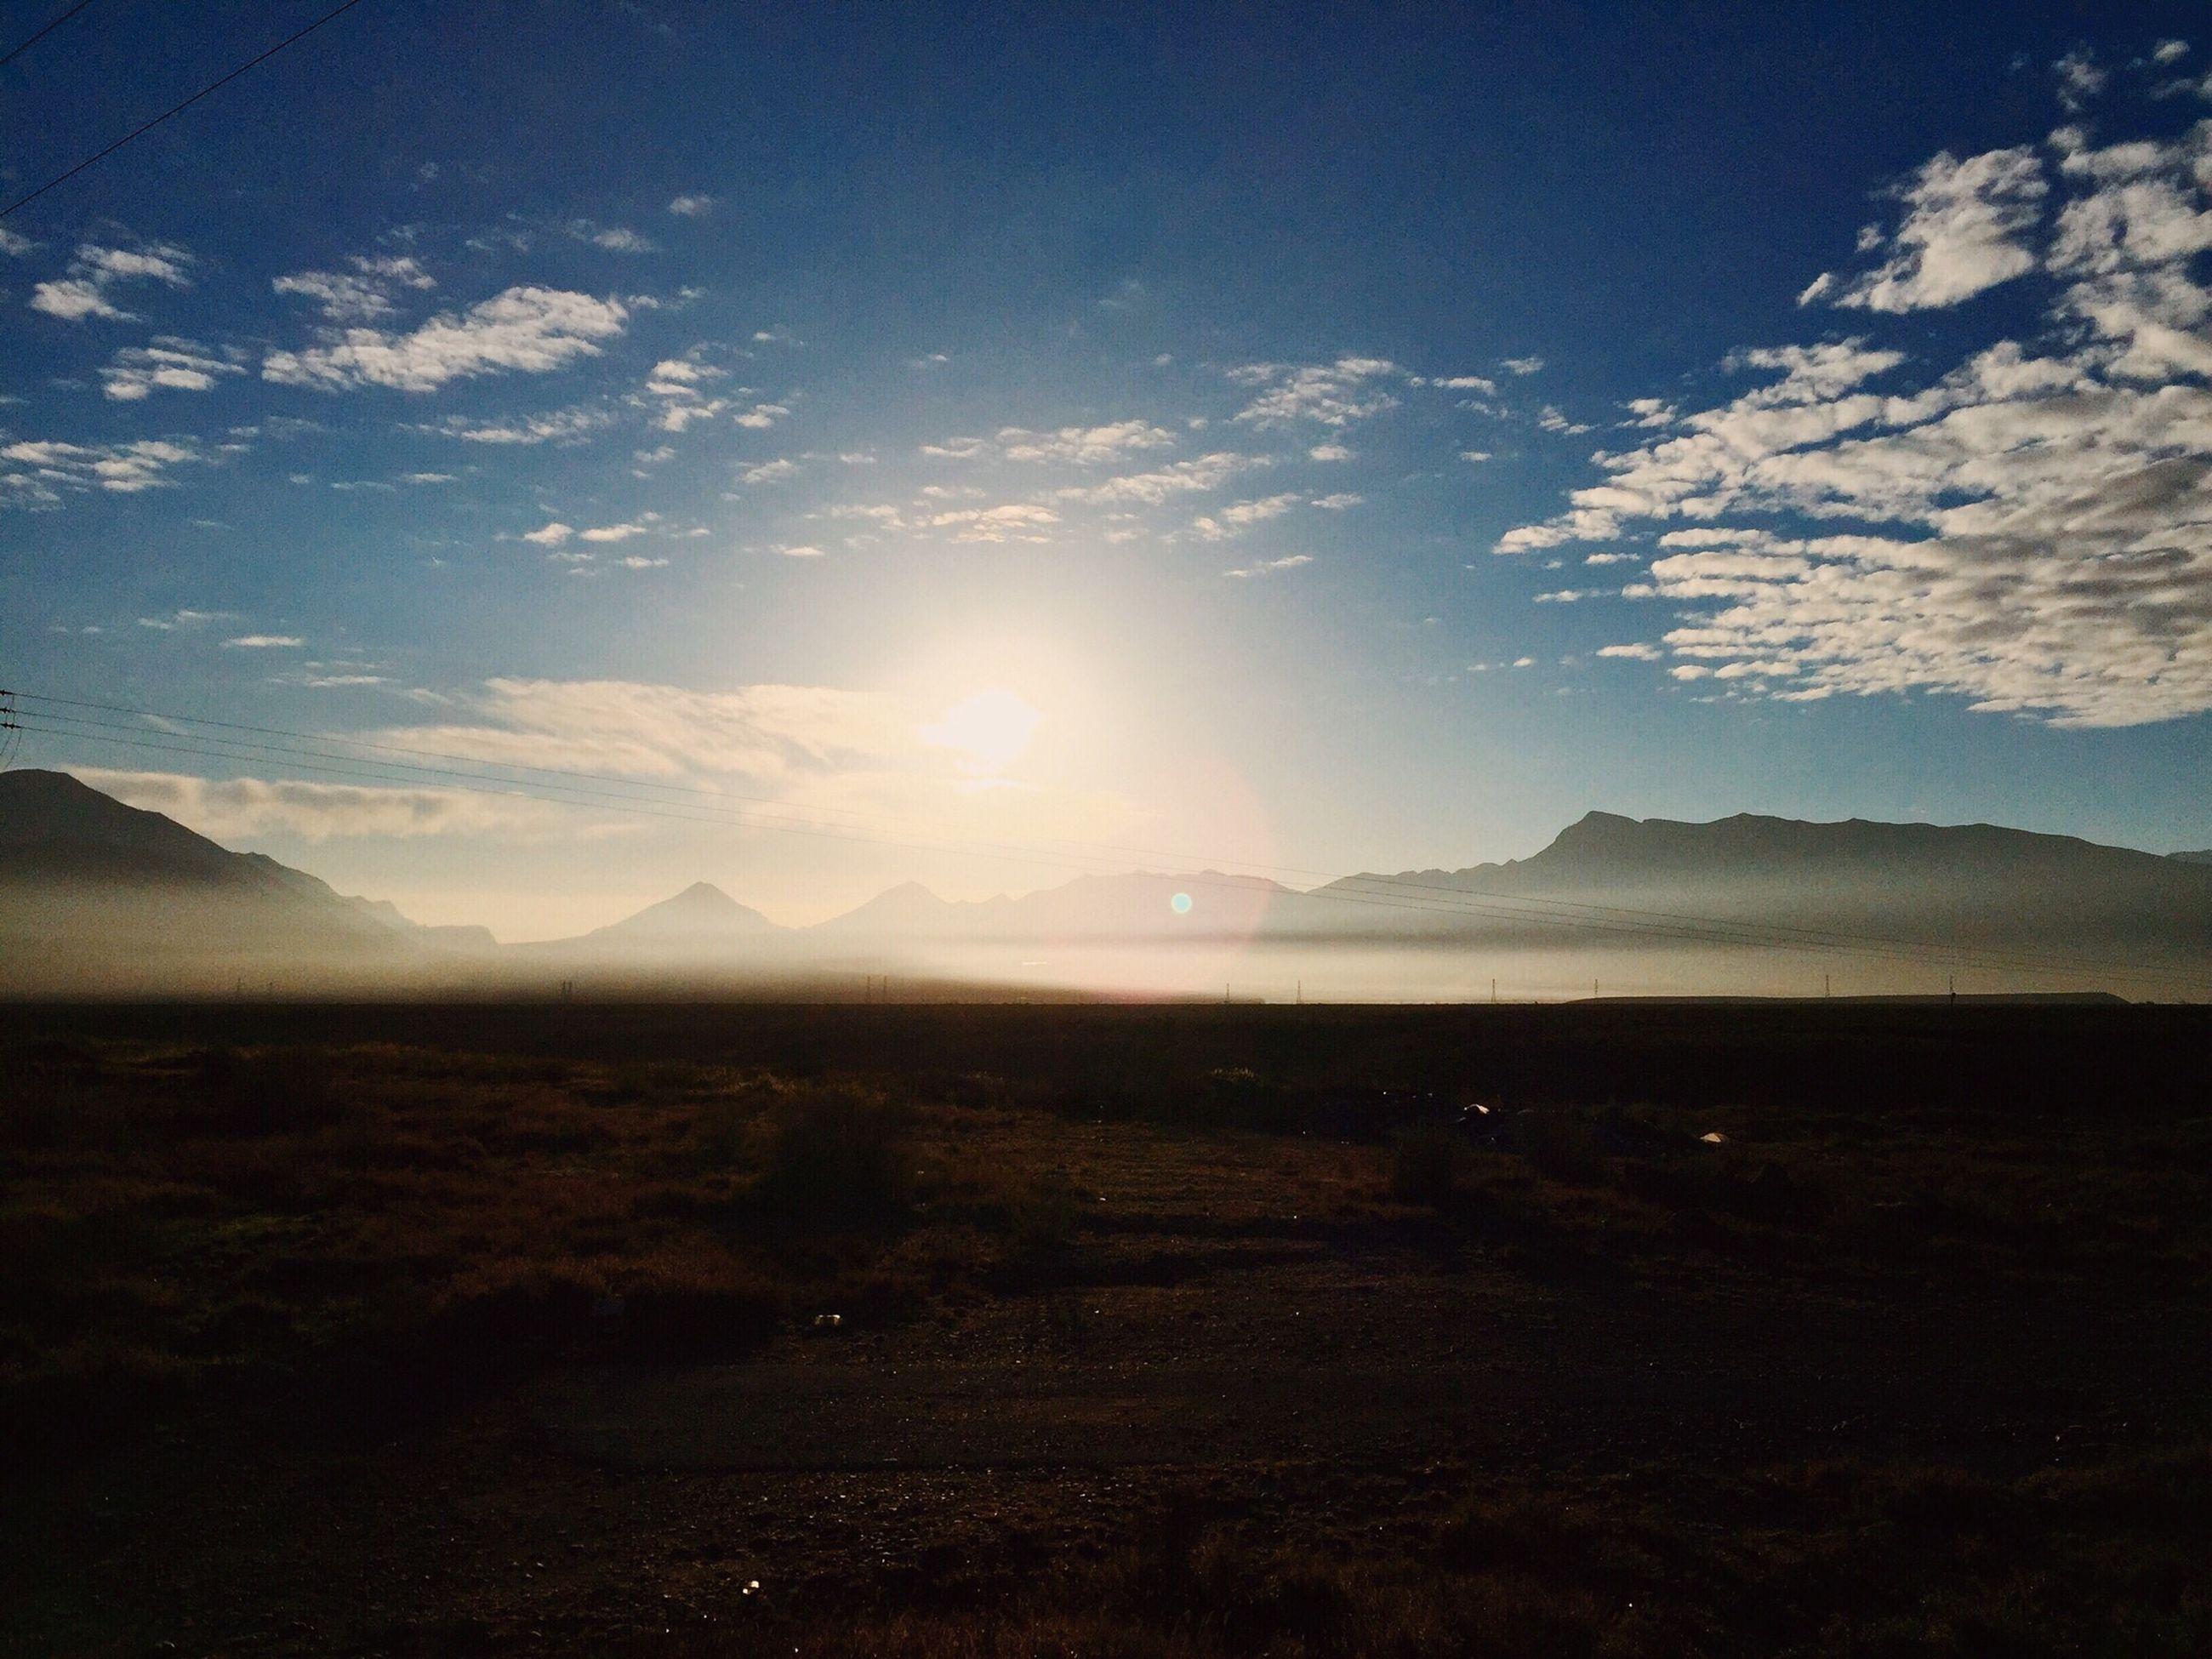 tranquil scene, mountain, tranquility, scenics, landscape, sky, beauty in nature, mountain range, nature, cloud - sky, non-urban scene, sunlight, sun, idyllic, sunbeam, cloud, horizon over land, remote, outdoors, sunset